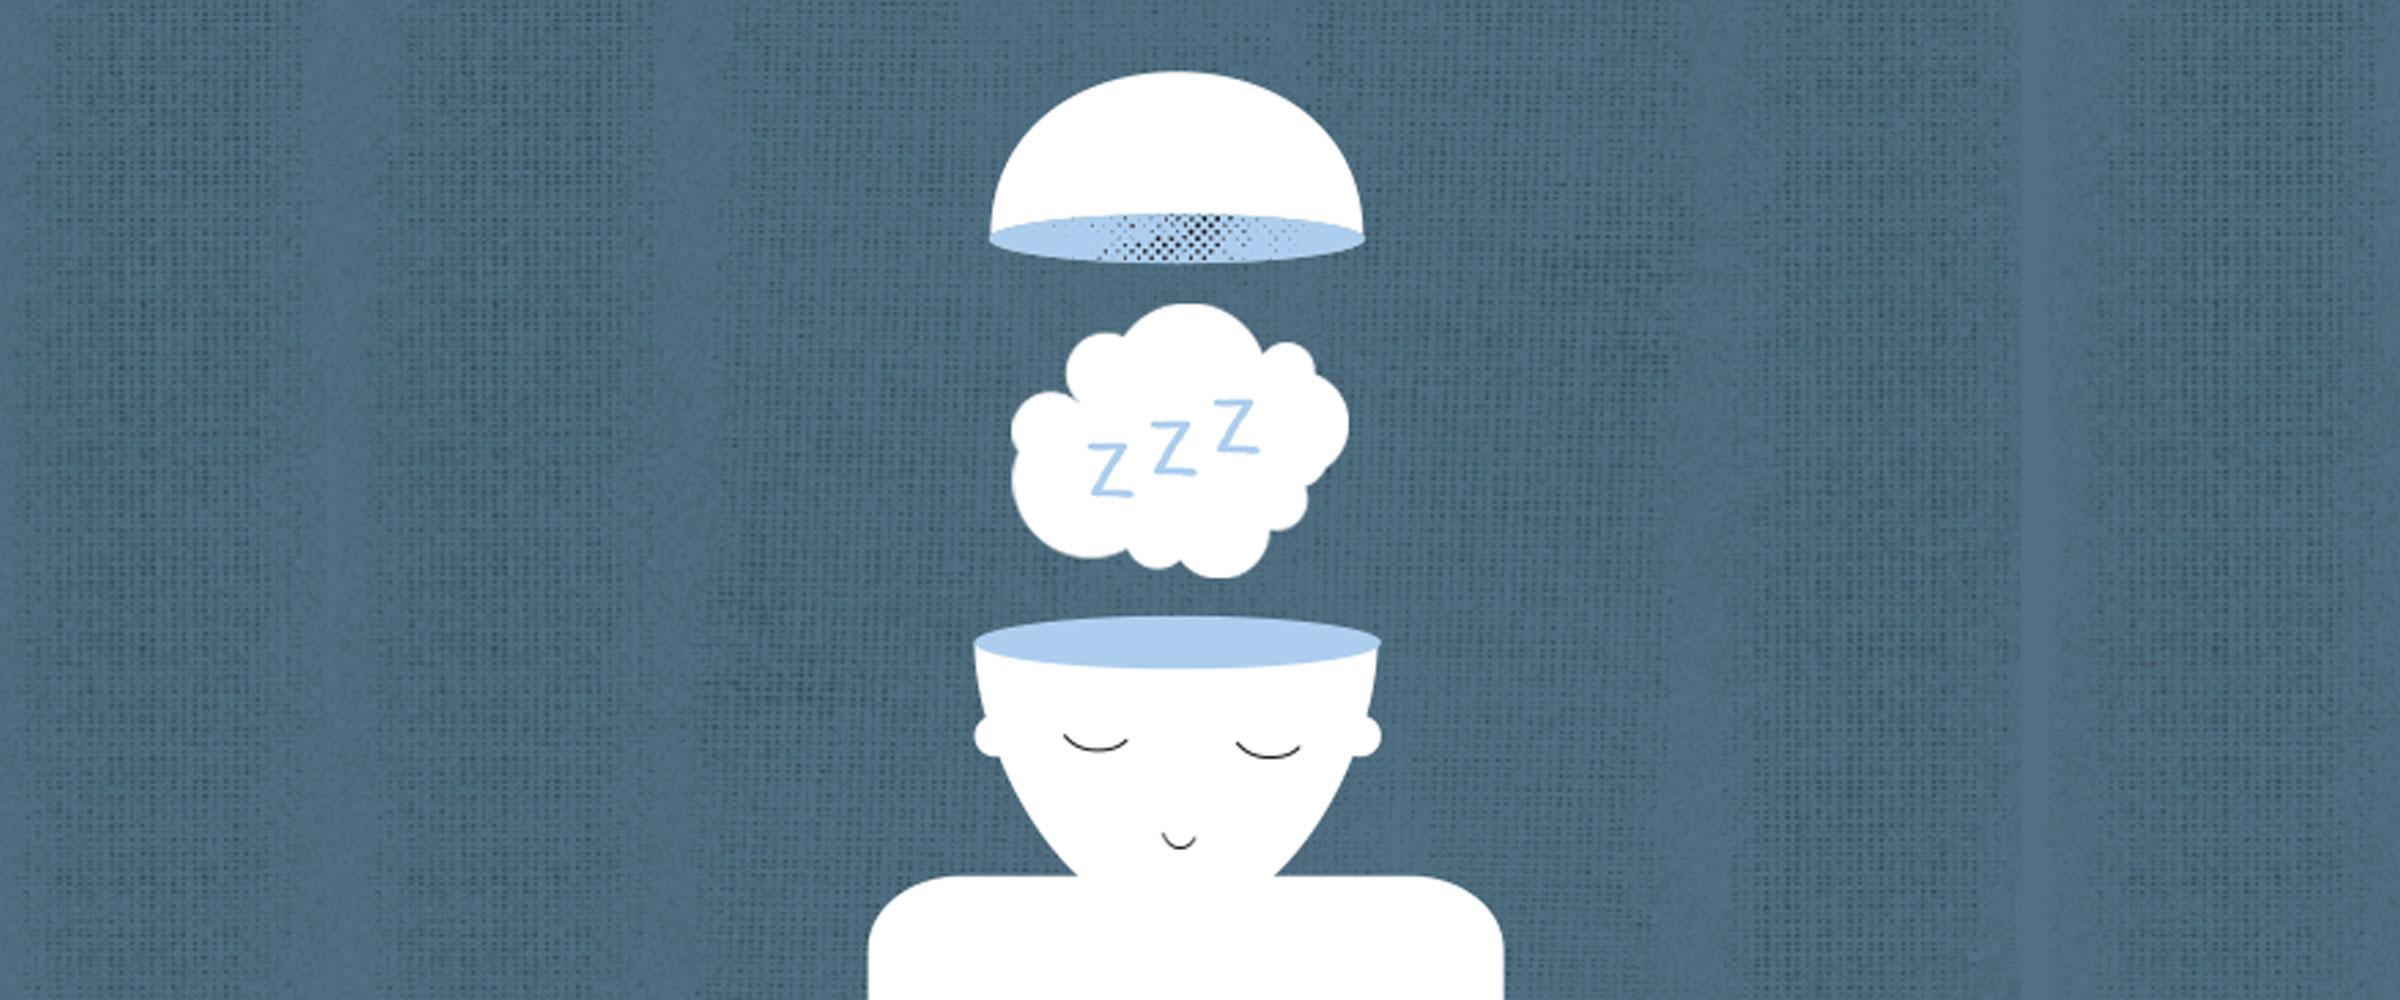 Meditation and Sleeping